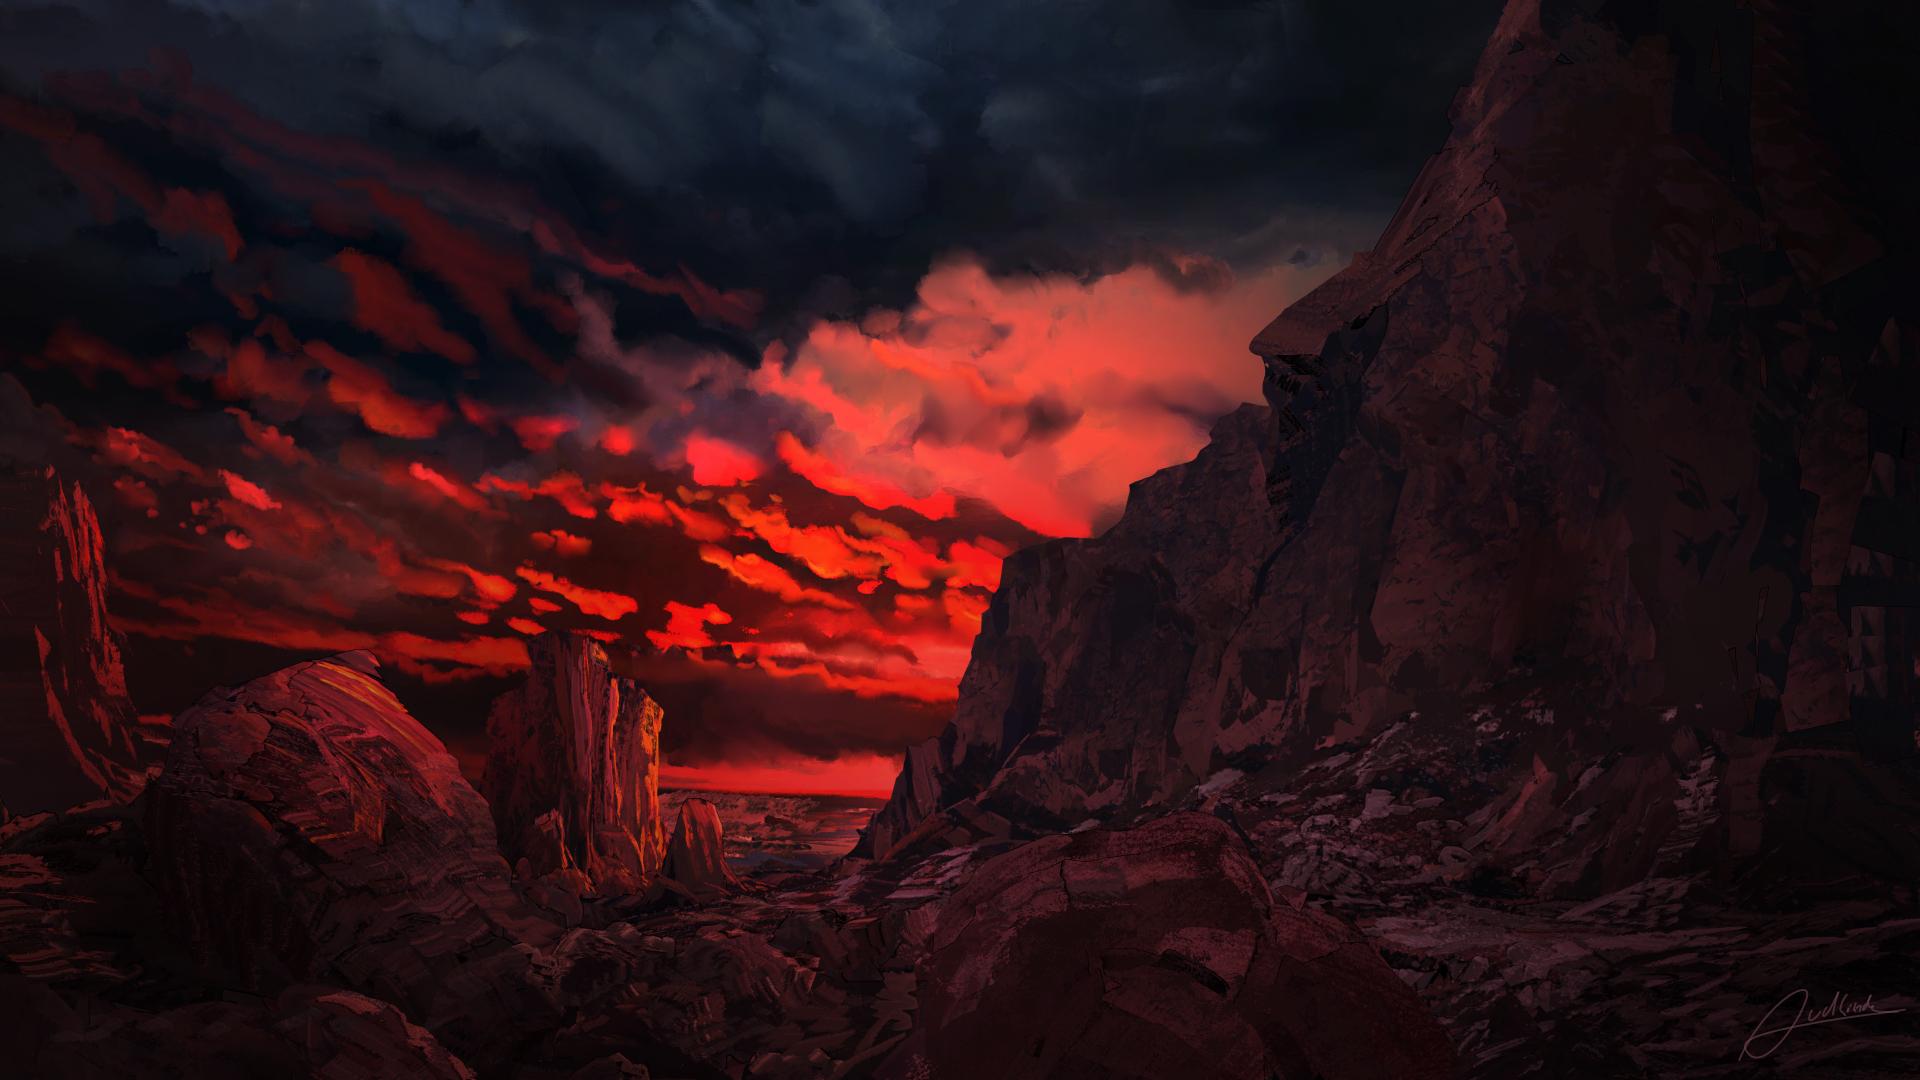 1920x1080 Red Mountains 1080p Laptop Full Hd Wallpaper Hd